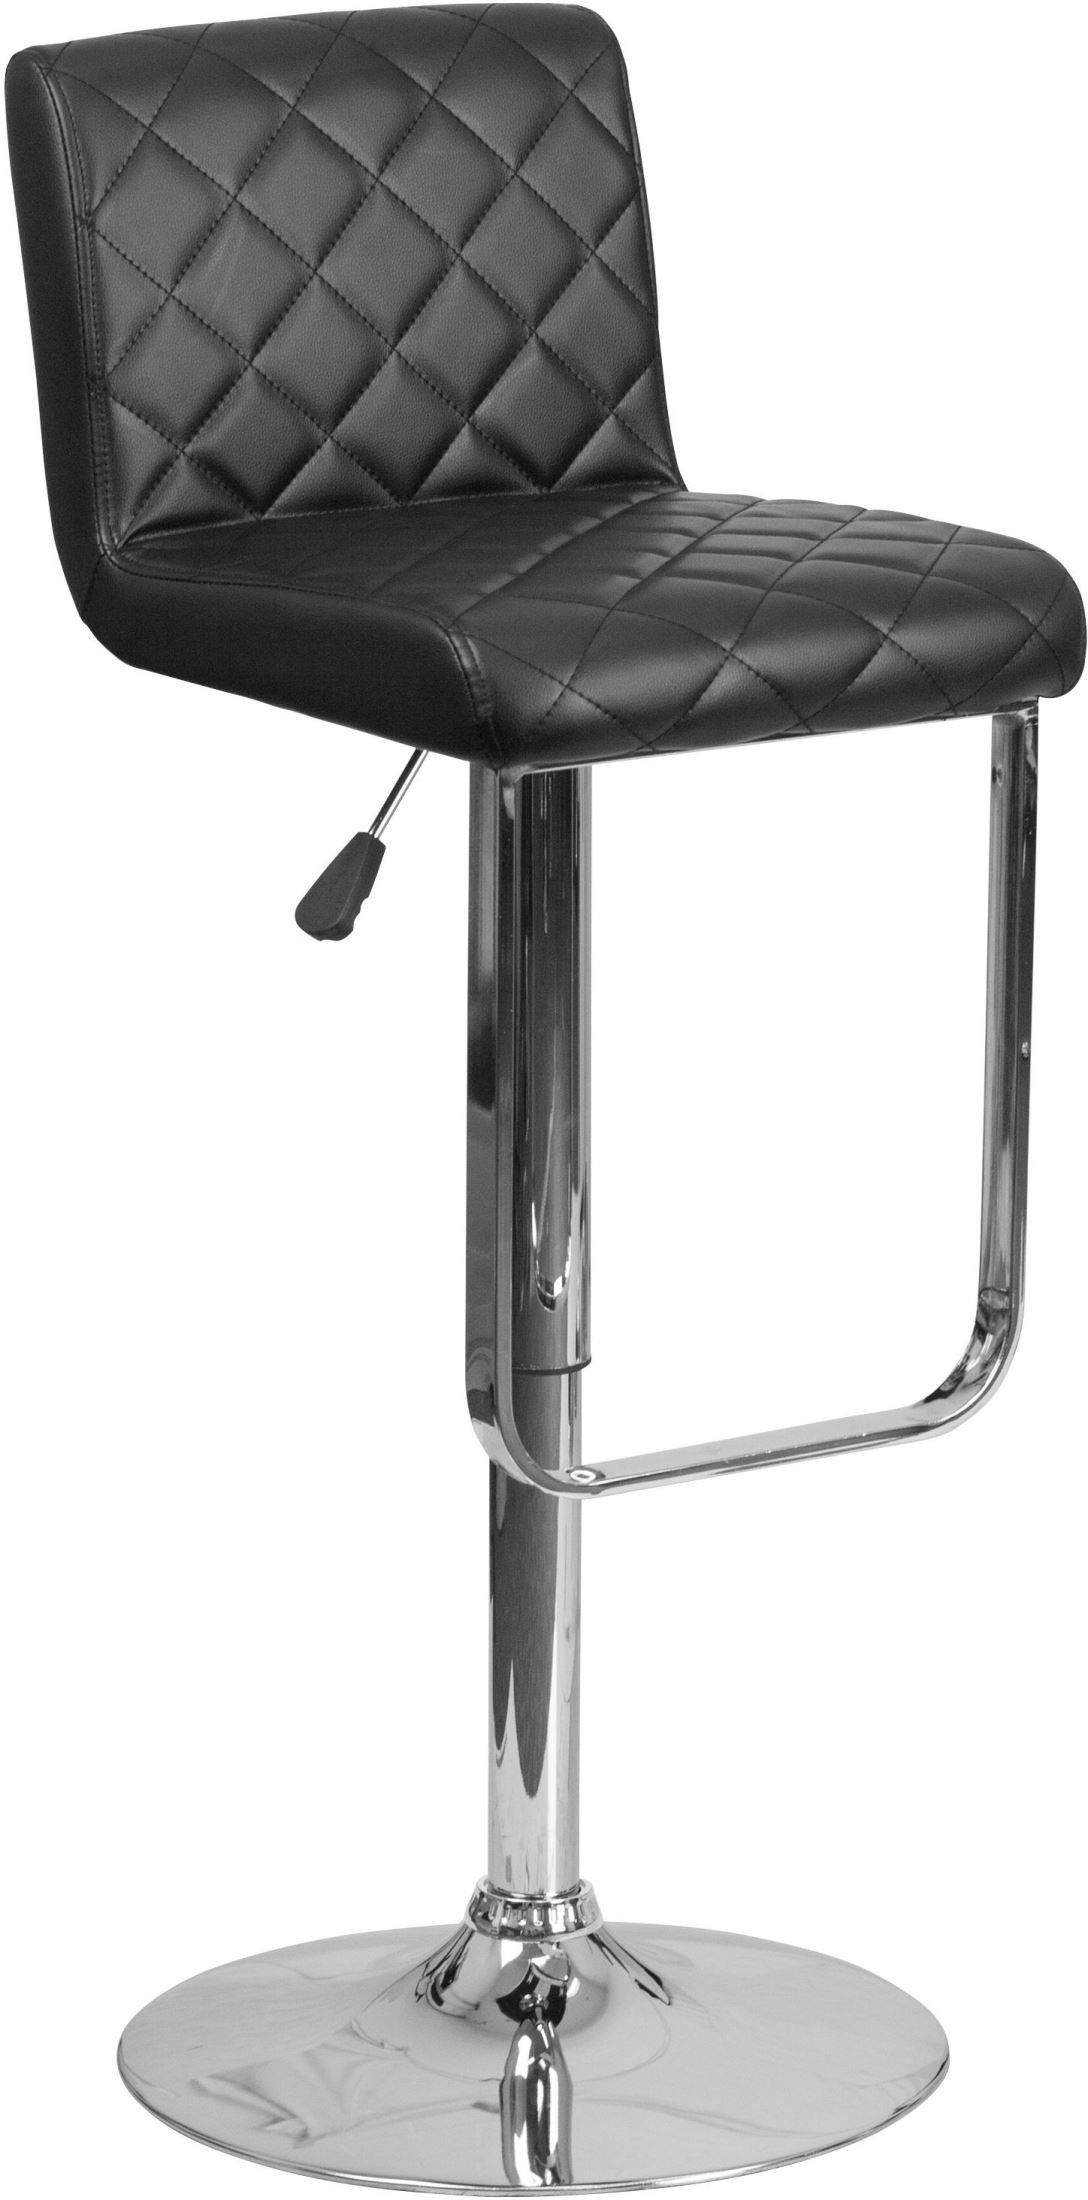 quilted swivel chair ergonomic knee design covering black vinyl adjustable